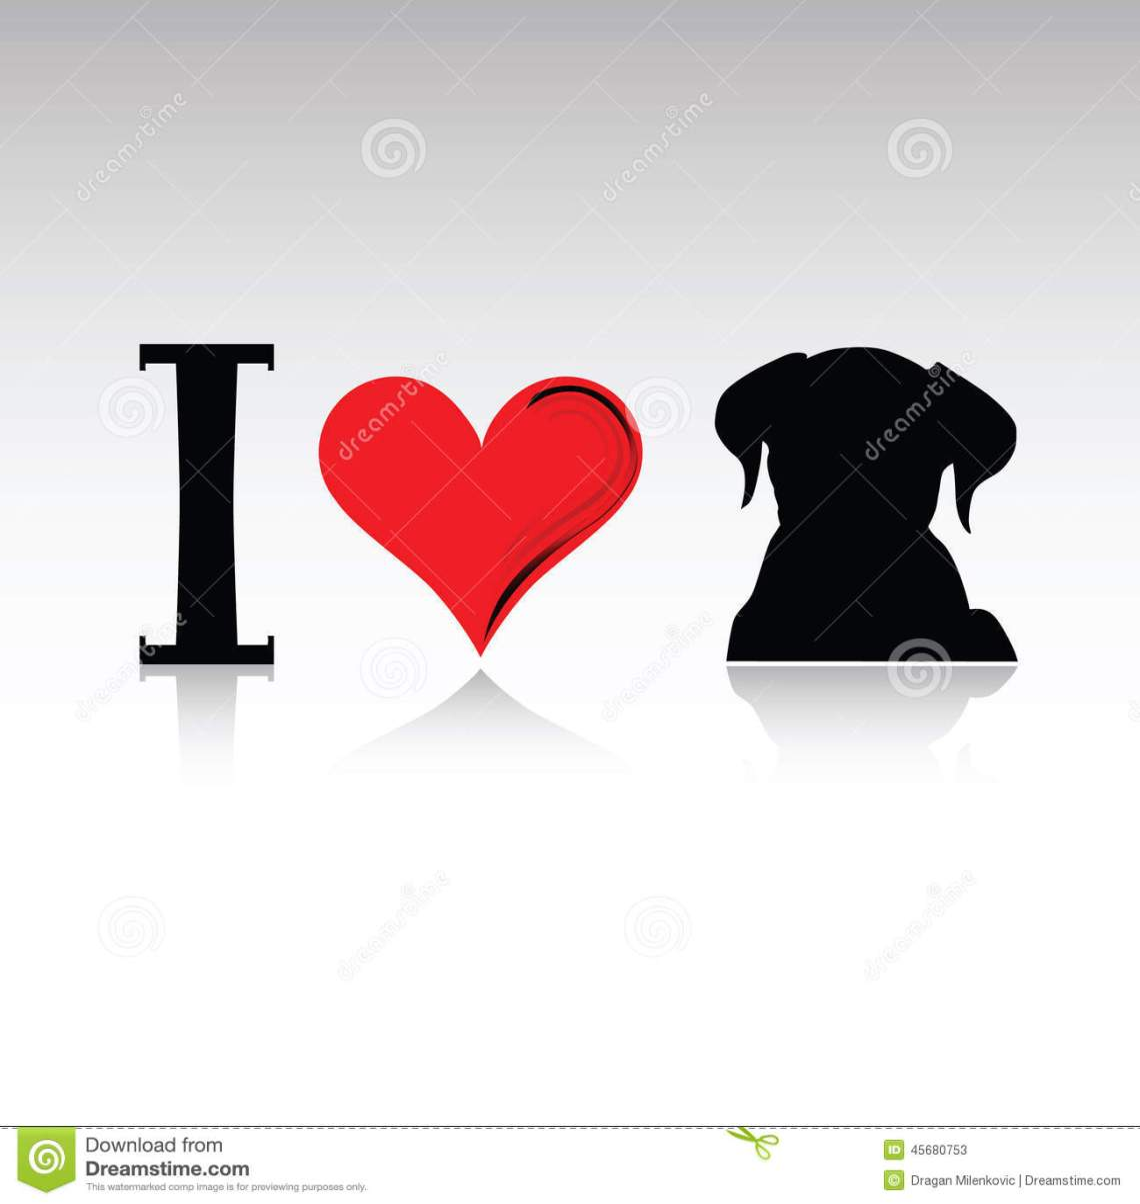 Download Sign I Love Dog Vector Illustration Stock Vector ...